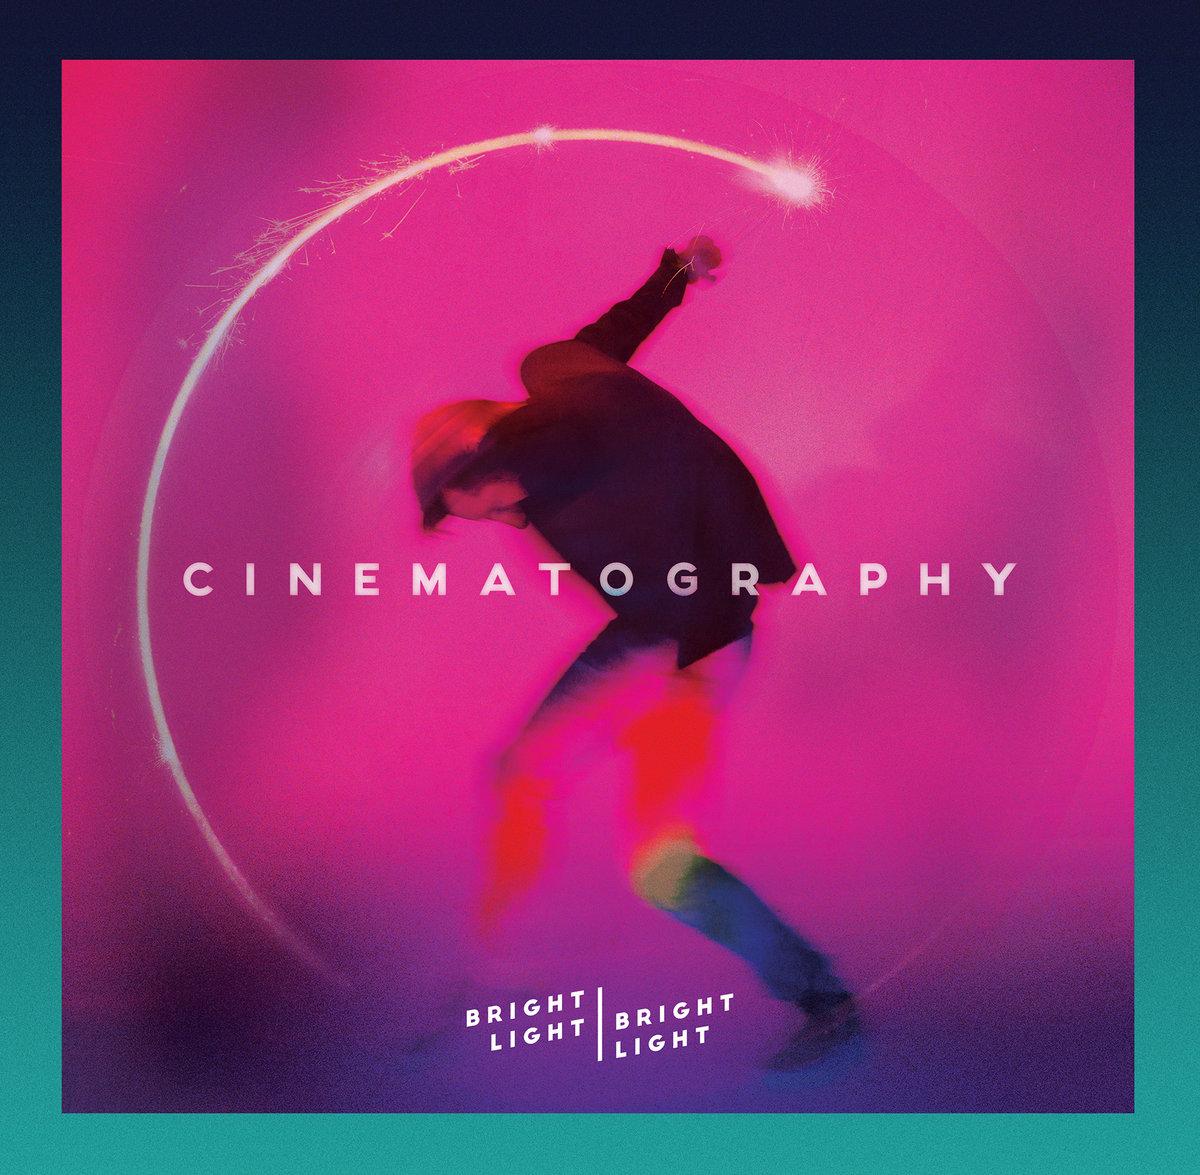 Cinematography bright light bright light by bright light bright light malvernweather Choice Image